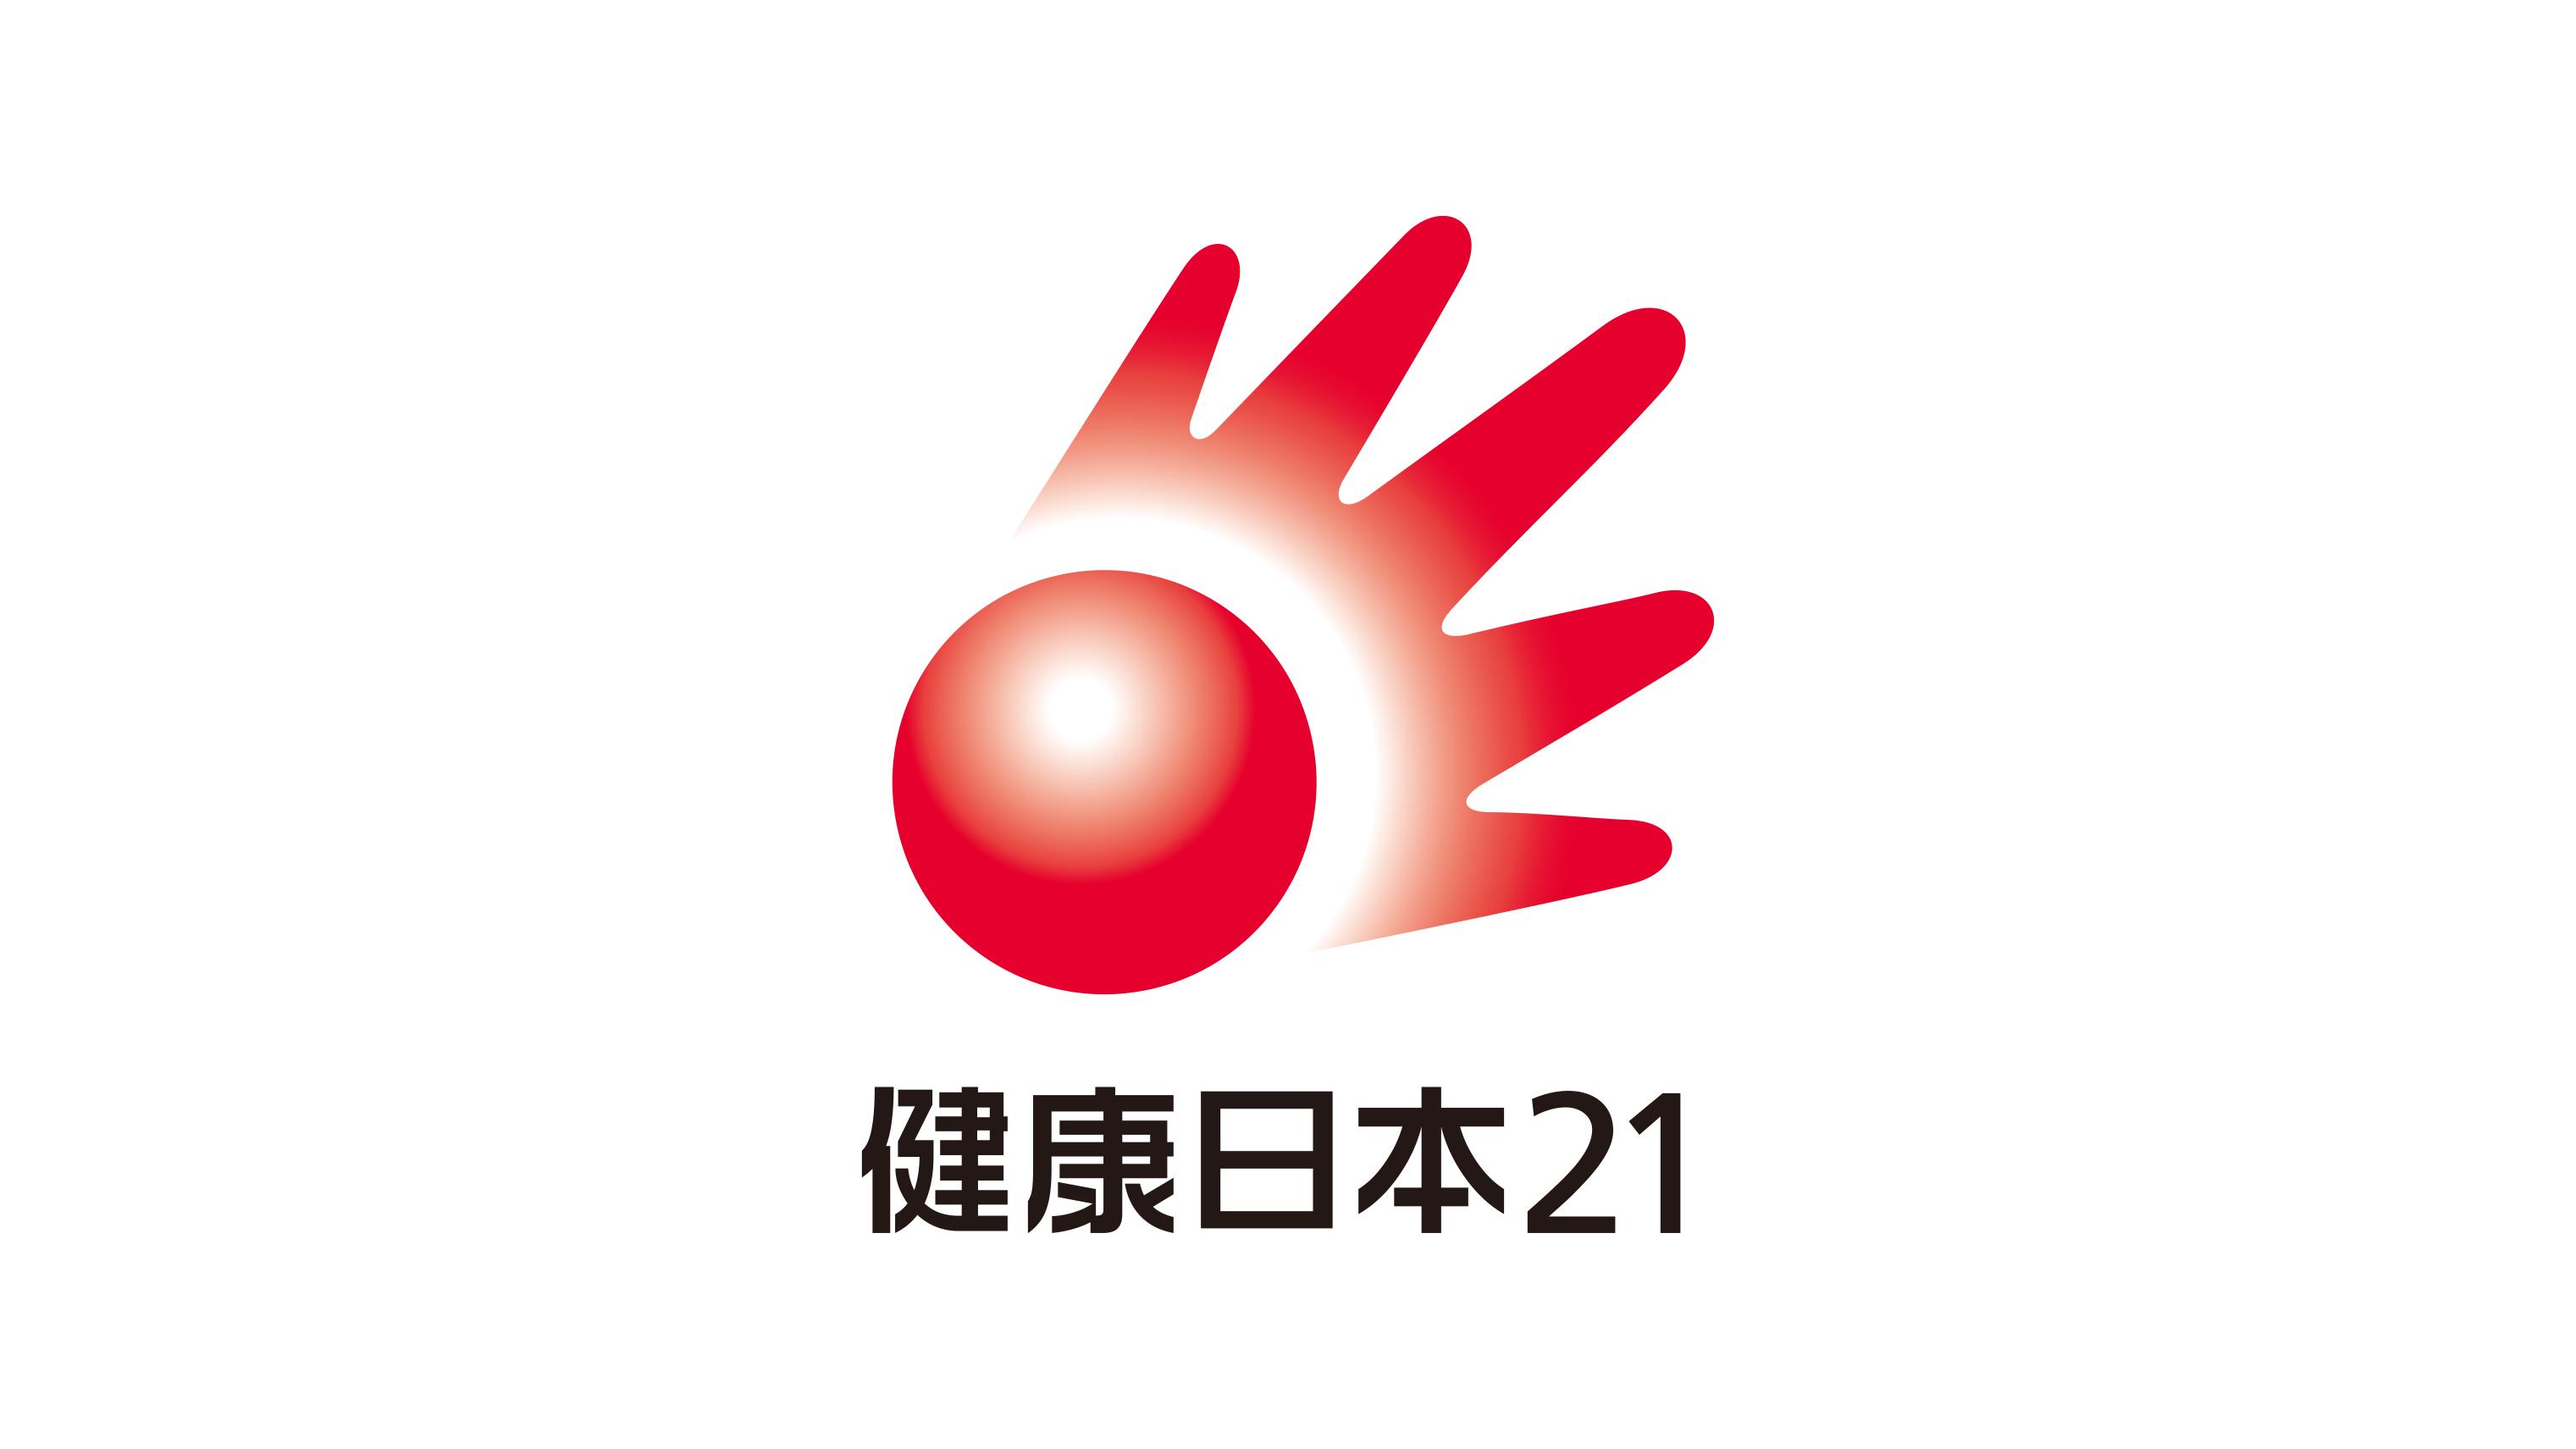 01_kenko21